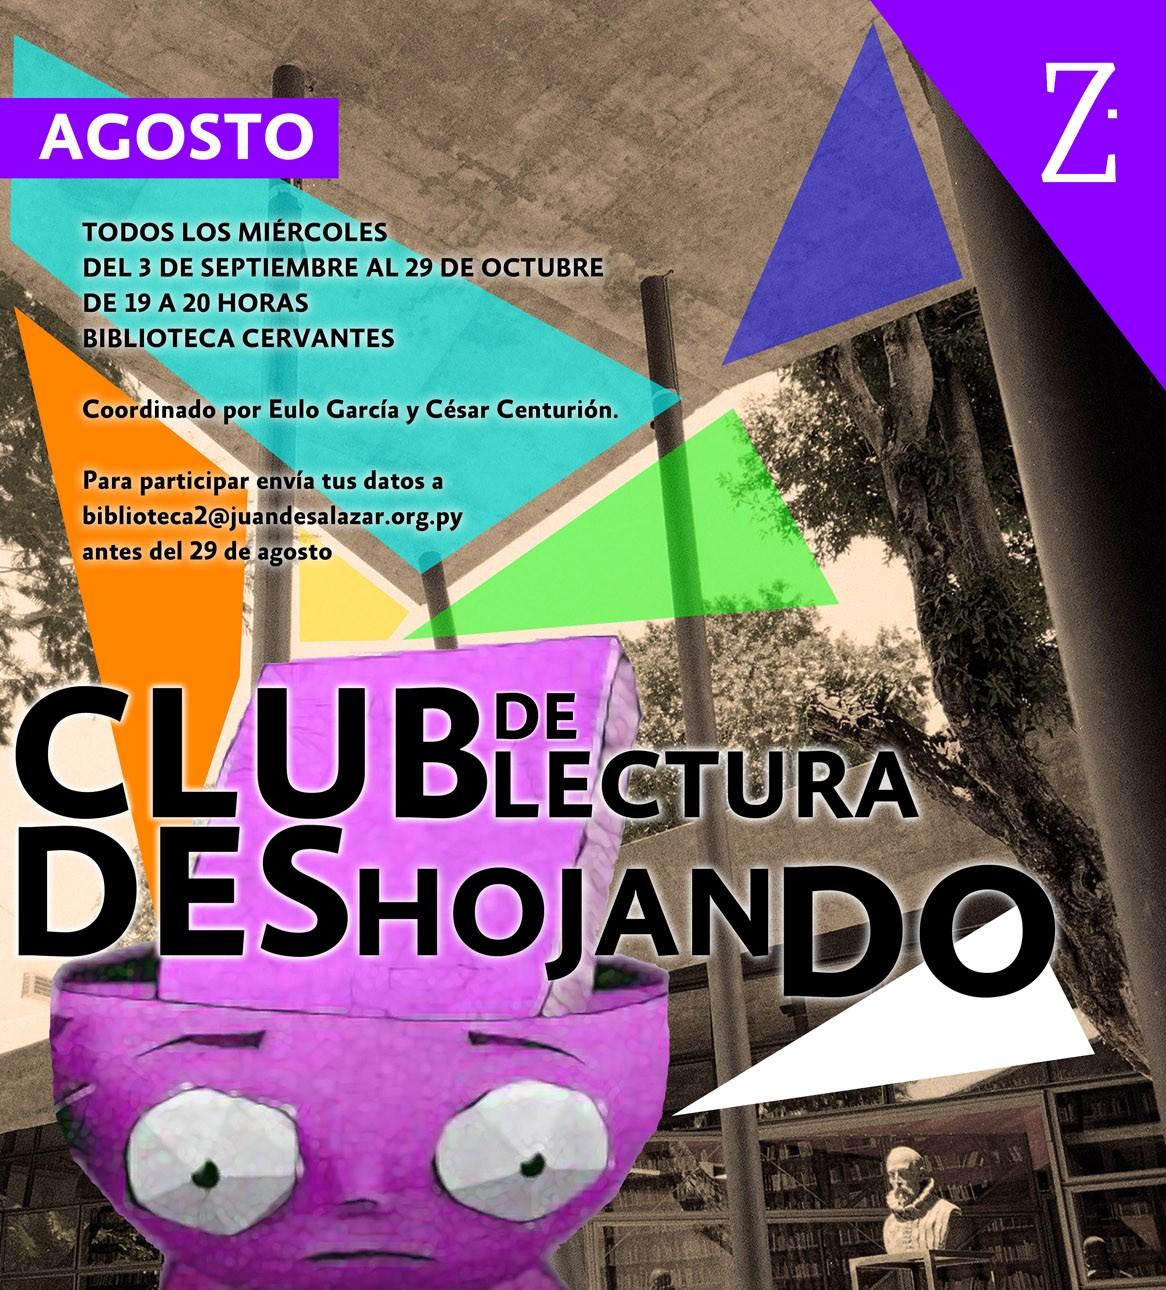 ClubDeLectura